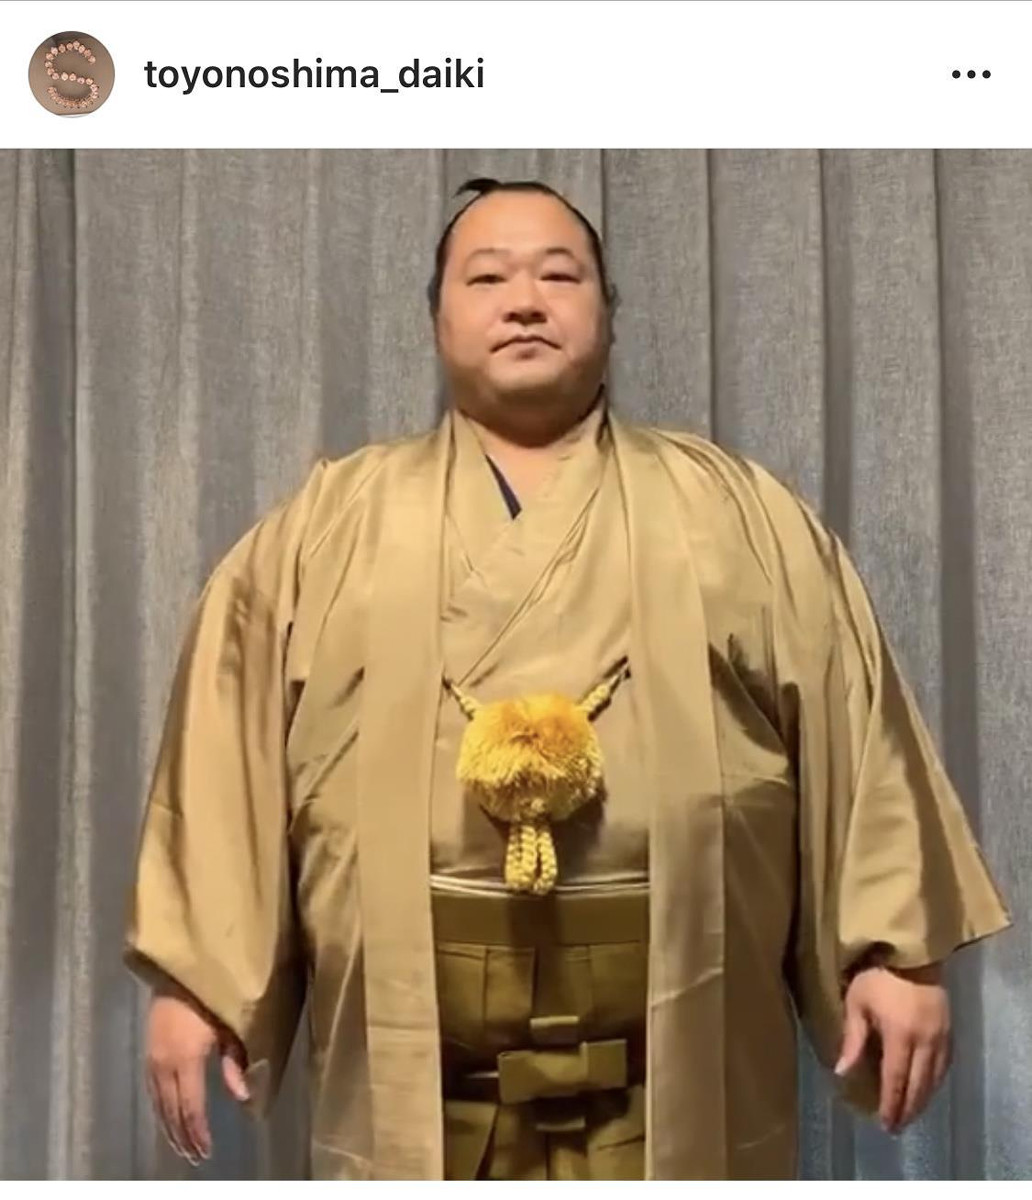 現役年寄一覧 - List of sumo elders - JapaneseClass.jp